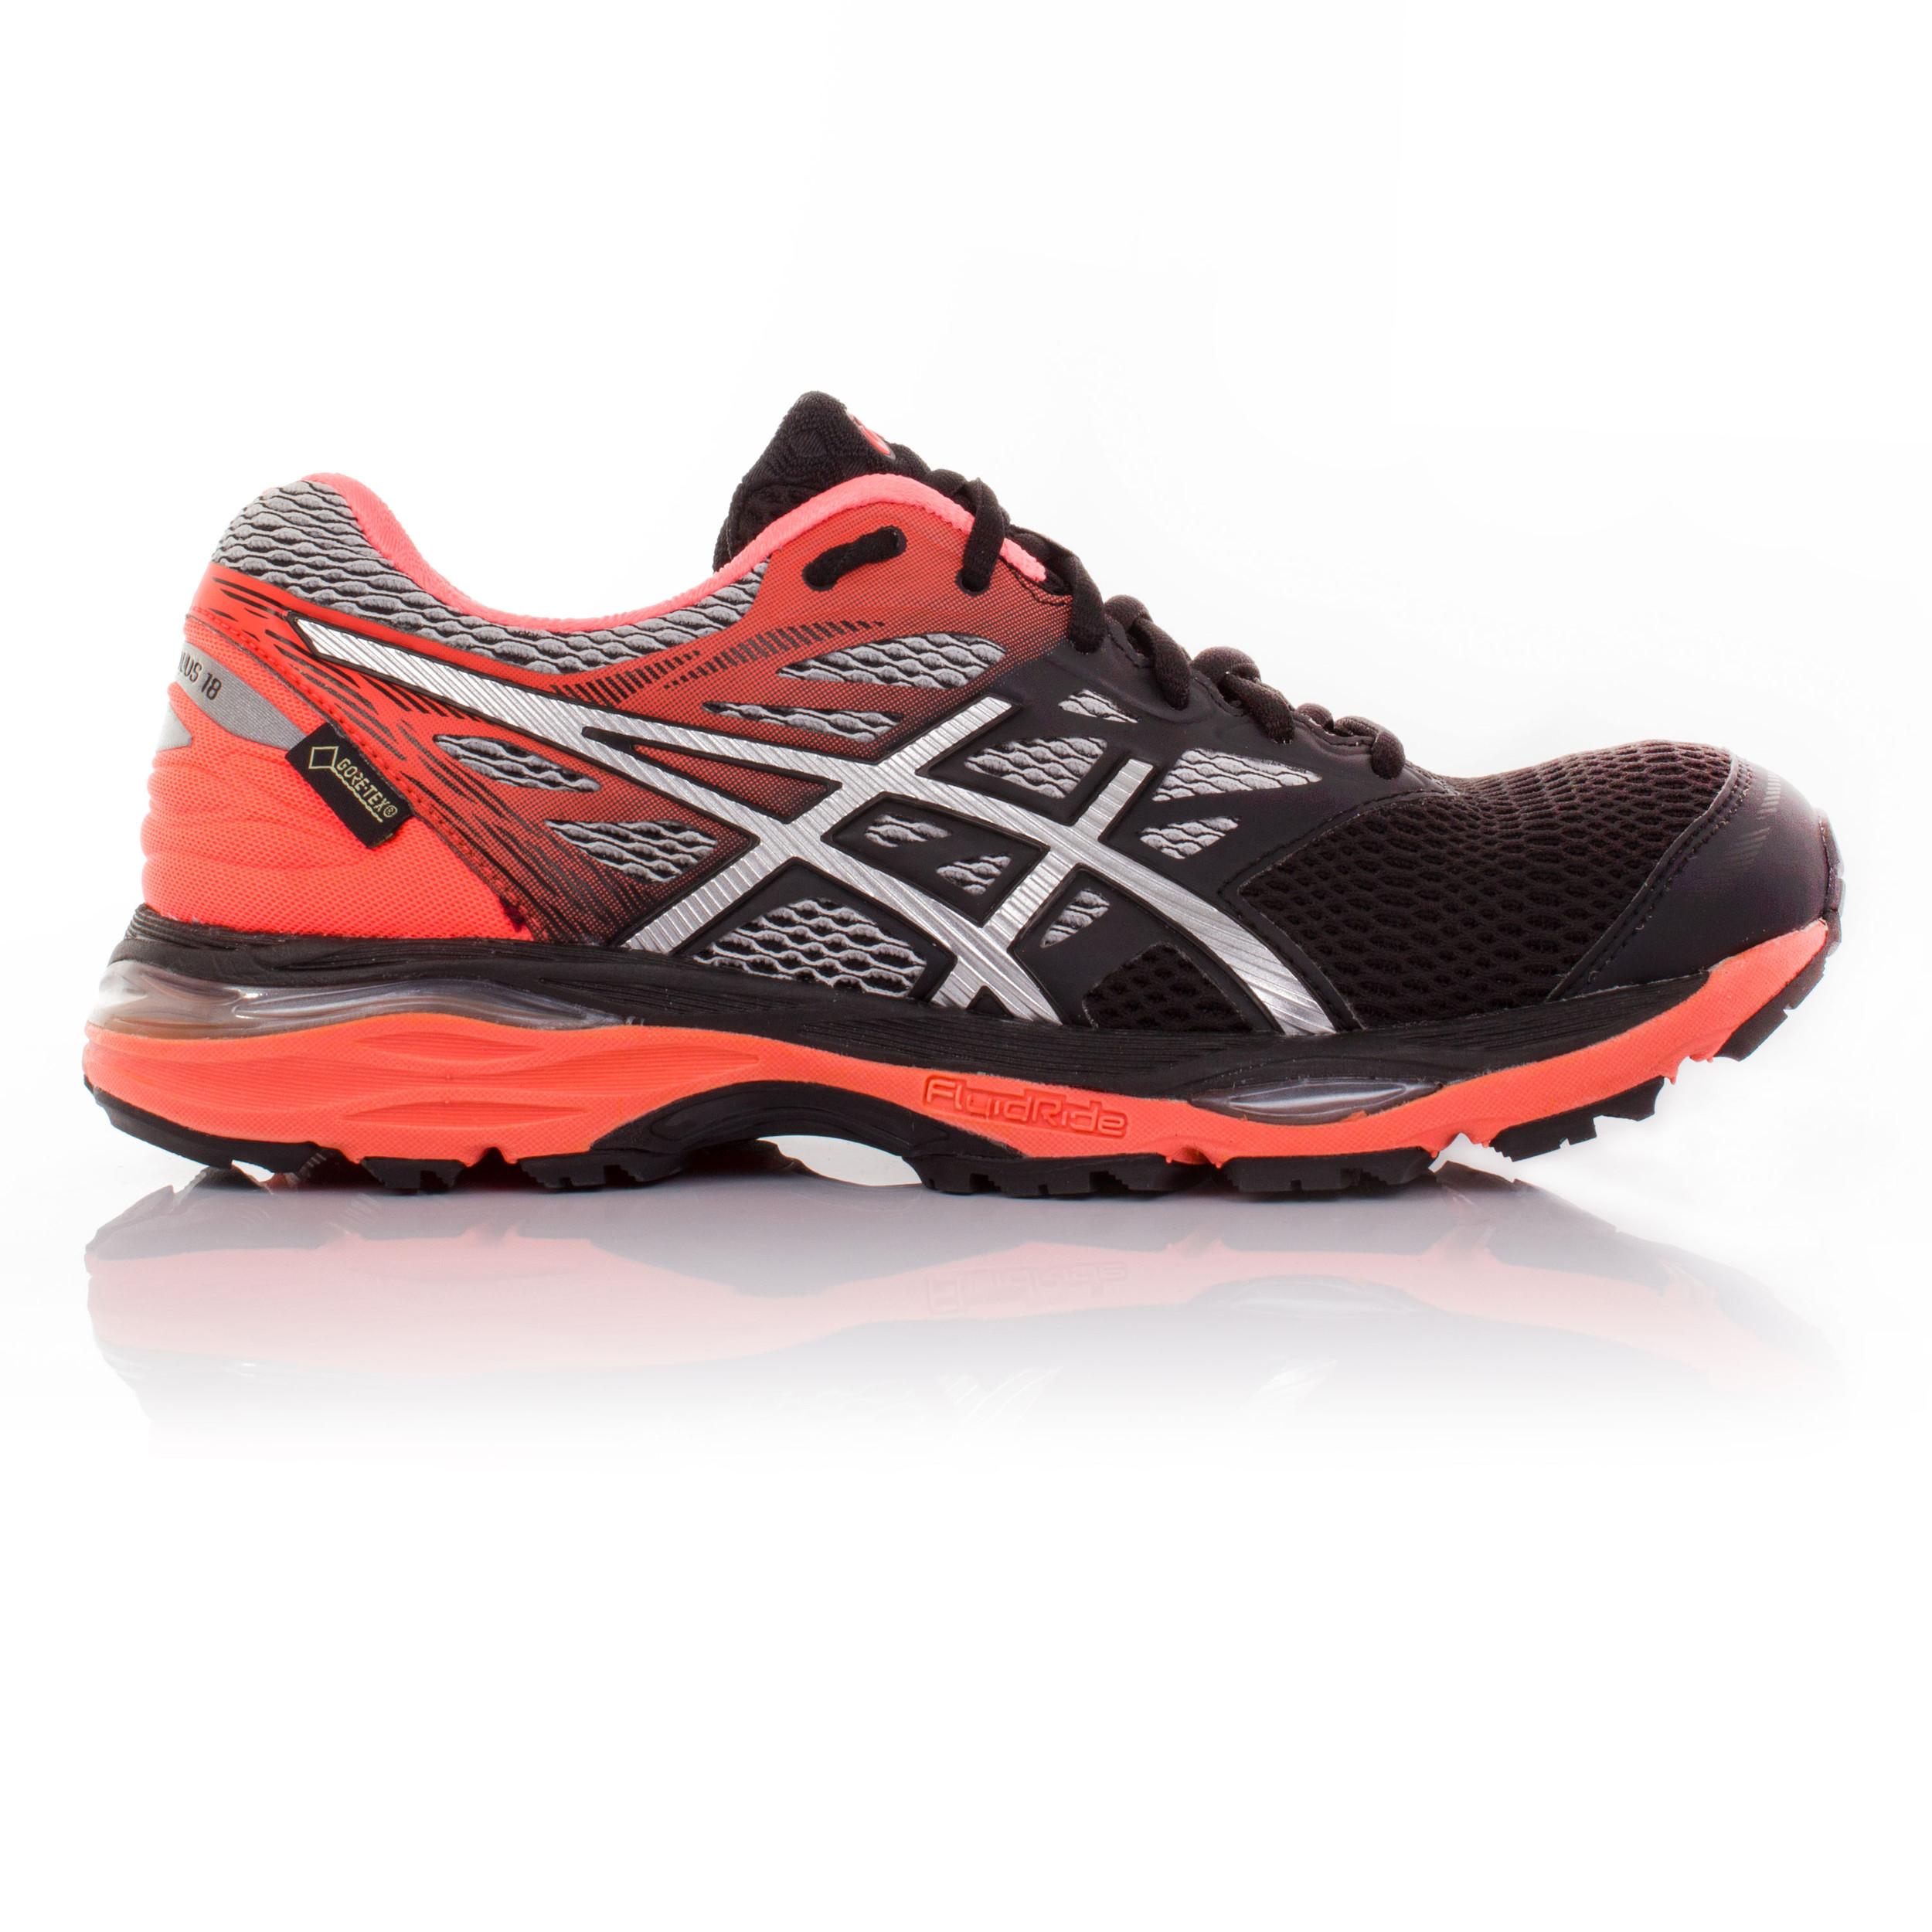 Running Shoes Puma Blacka An Dpink